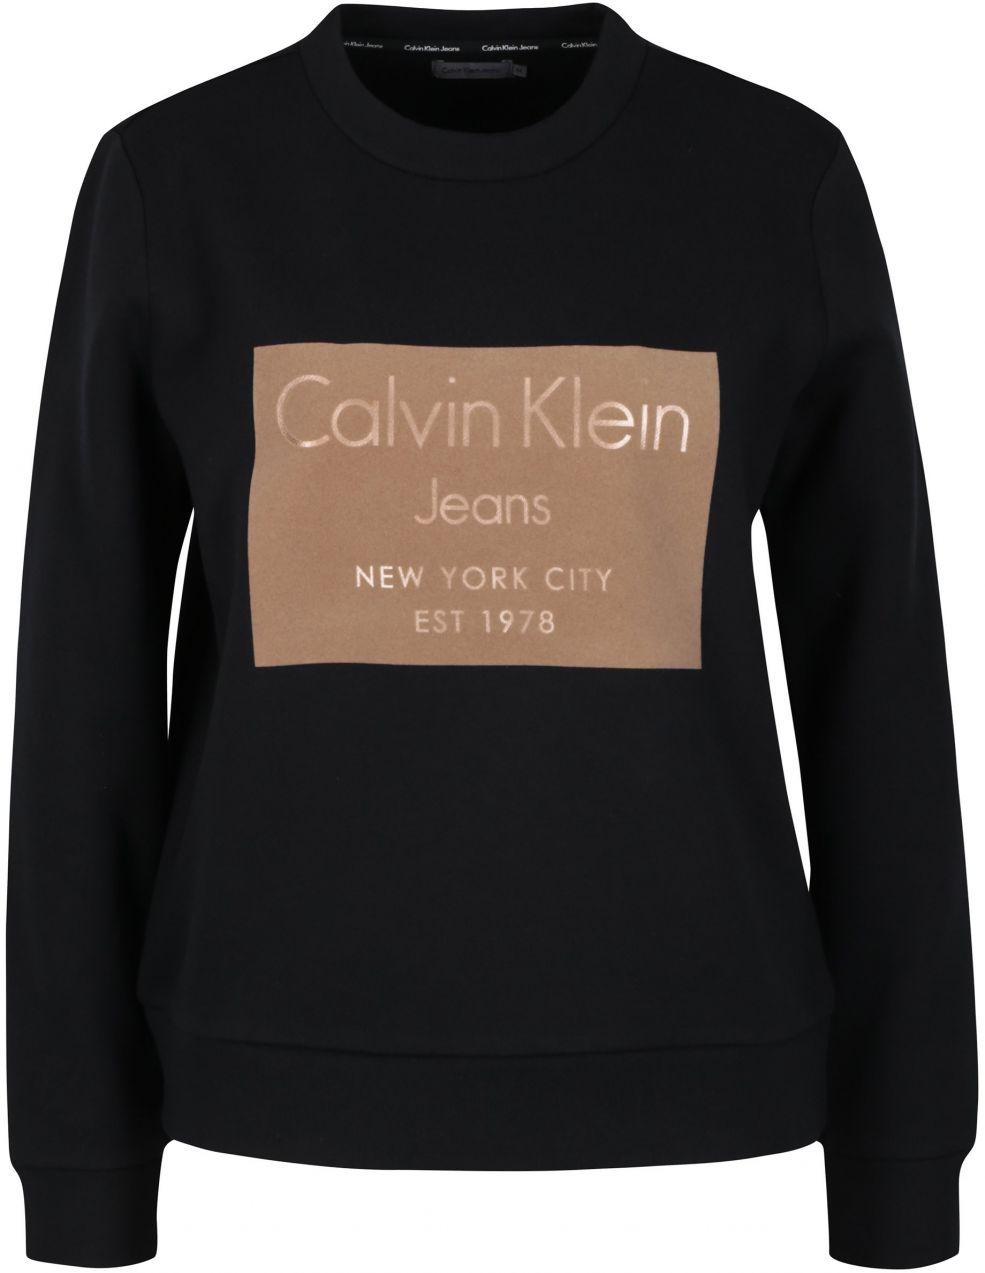 40ed3d8de14a Hnedo-čierna dámska mikina Calvin Klein Jeans Hansi značky Calvin Klein  Jeans - Lovely.sk